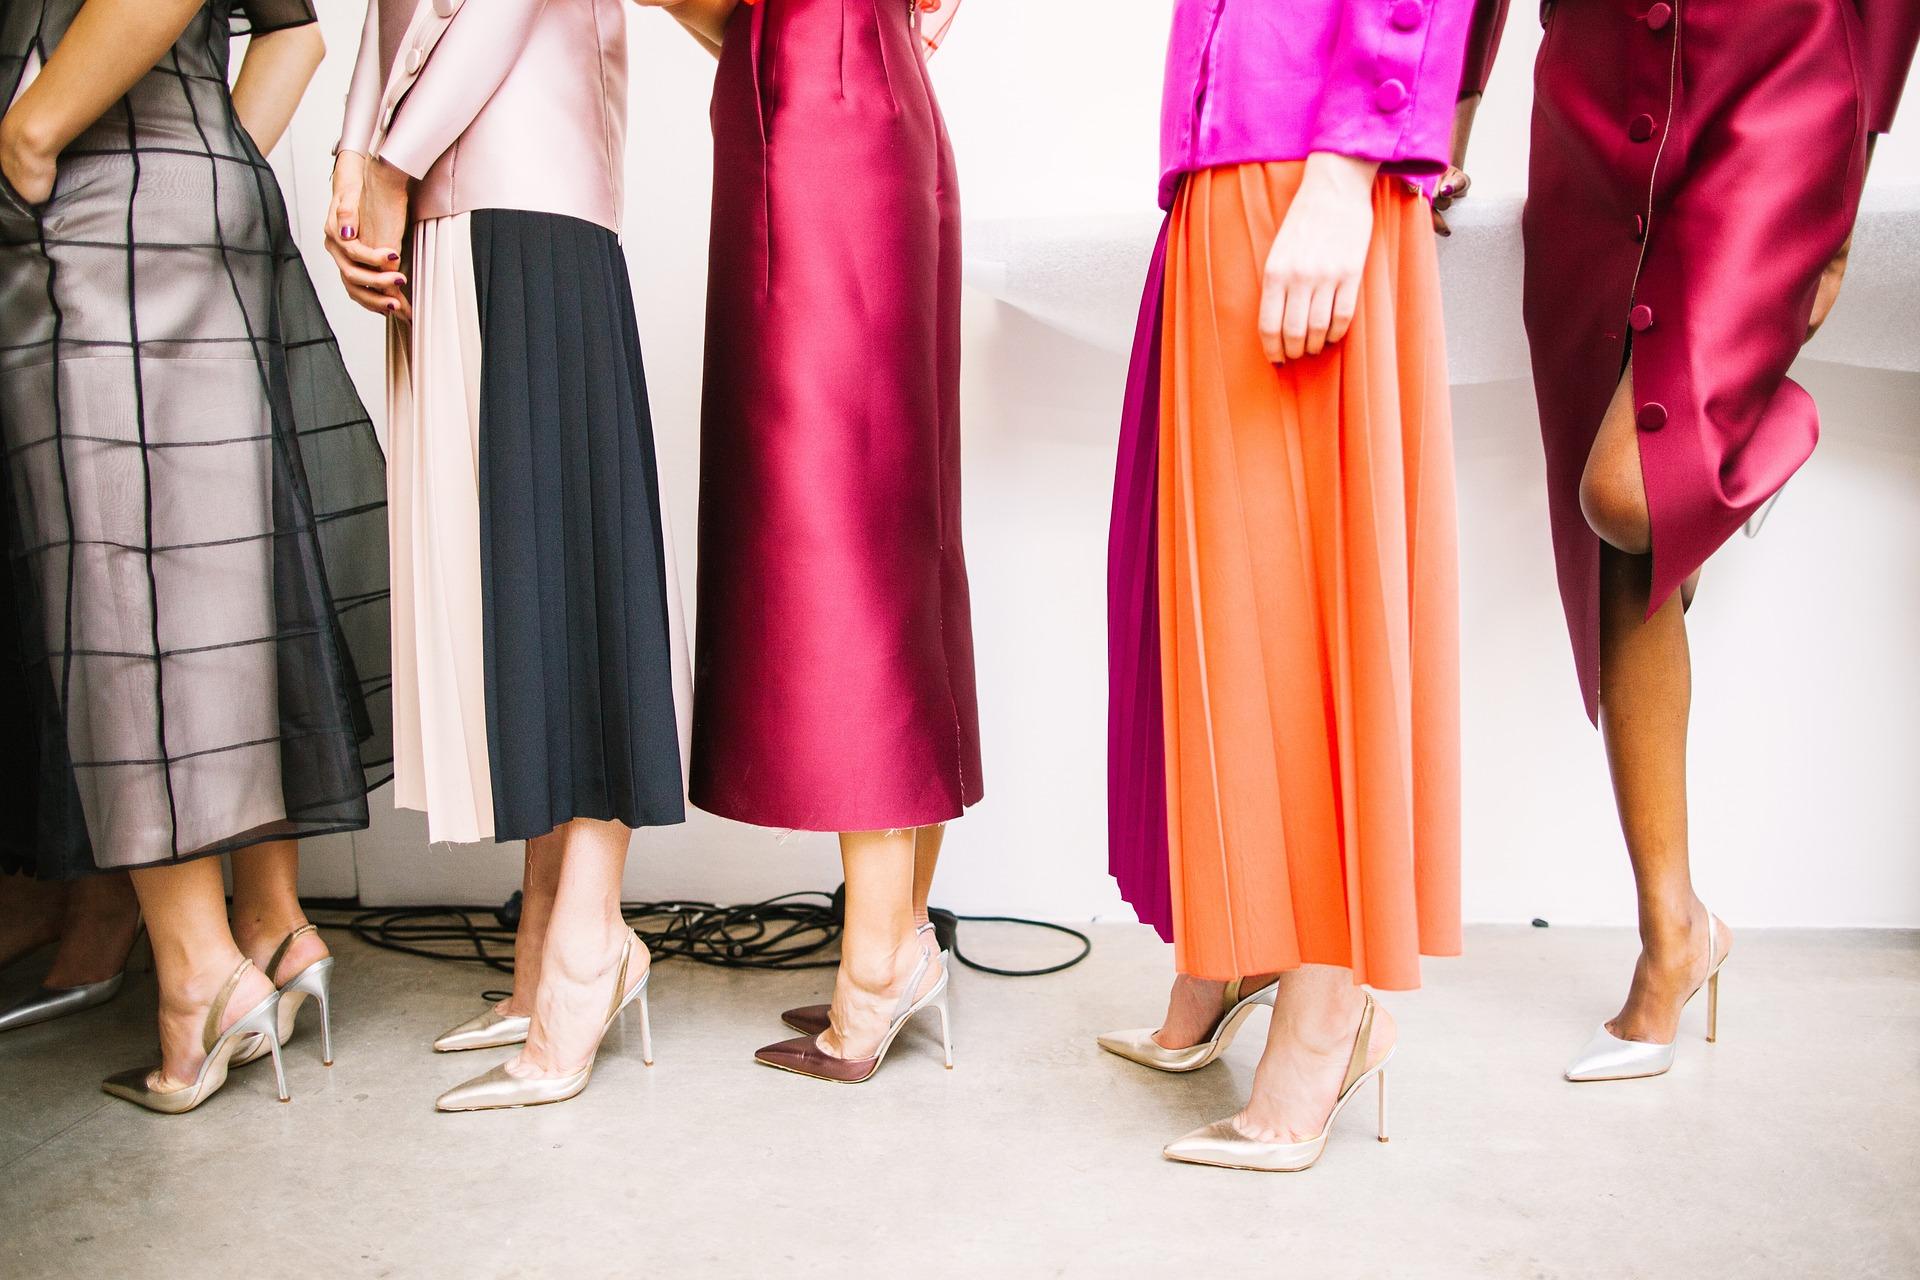 fashion models feet